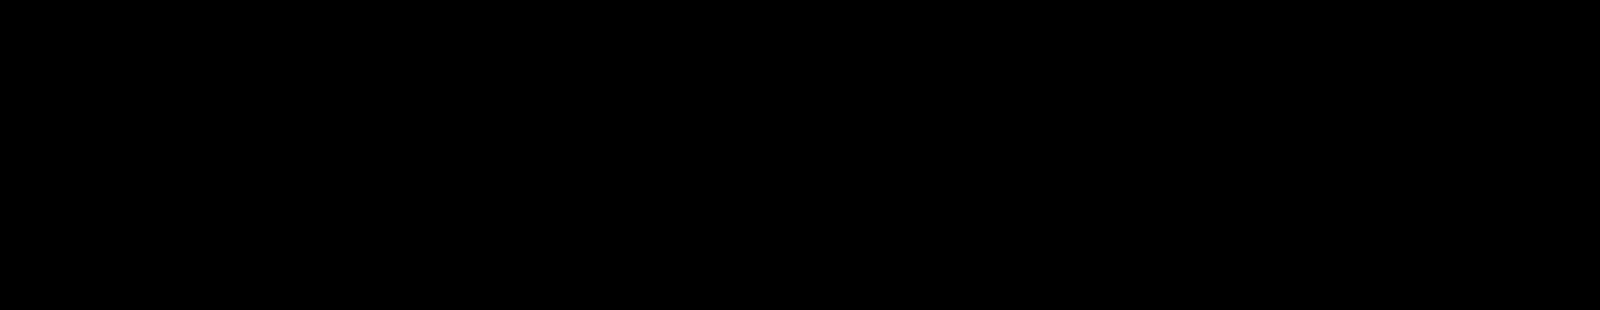 Anastasia_Beverly_Hills_logo